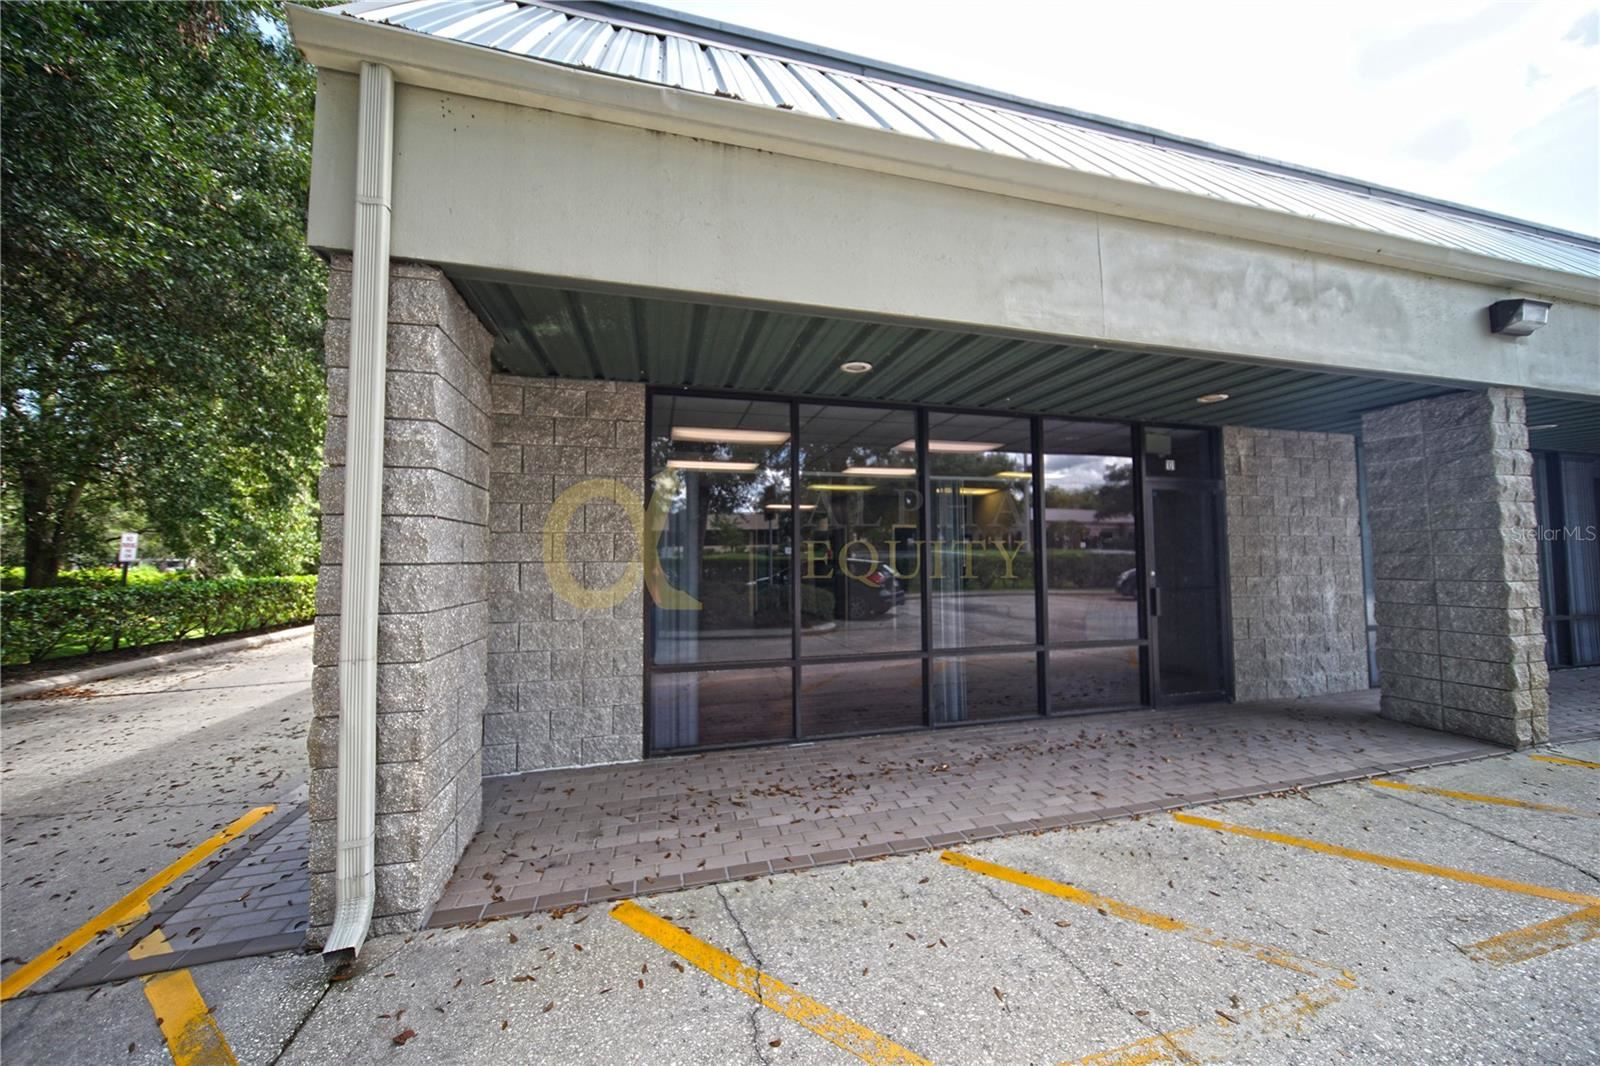 105 COMMERCE STREET #101, Lake Mary, FL 32746 - #: O5968691